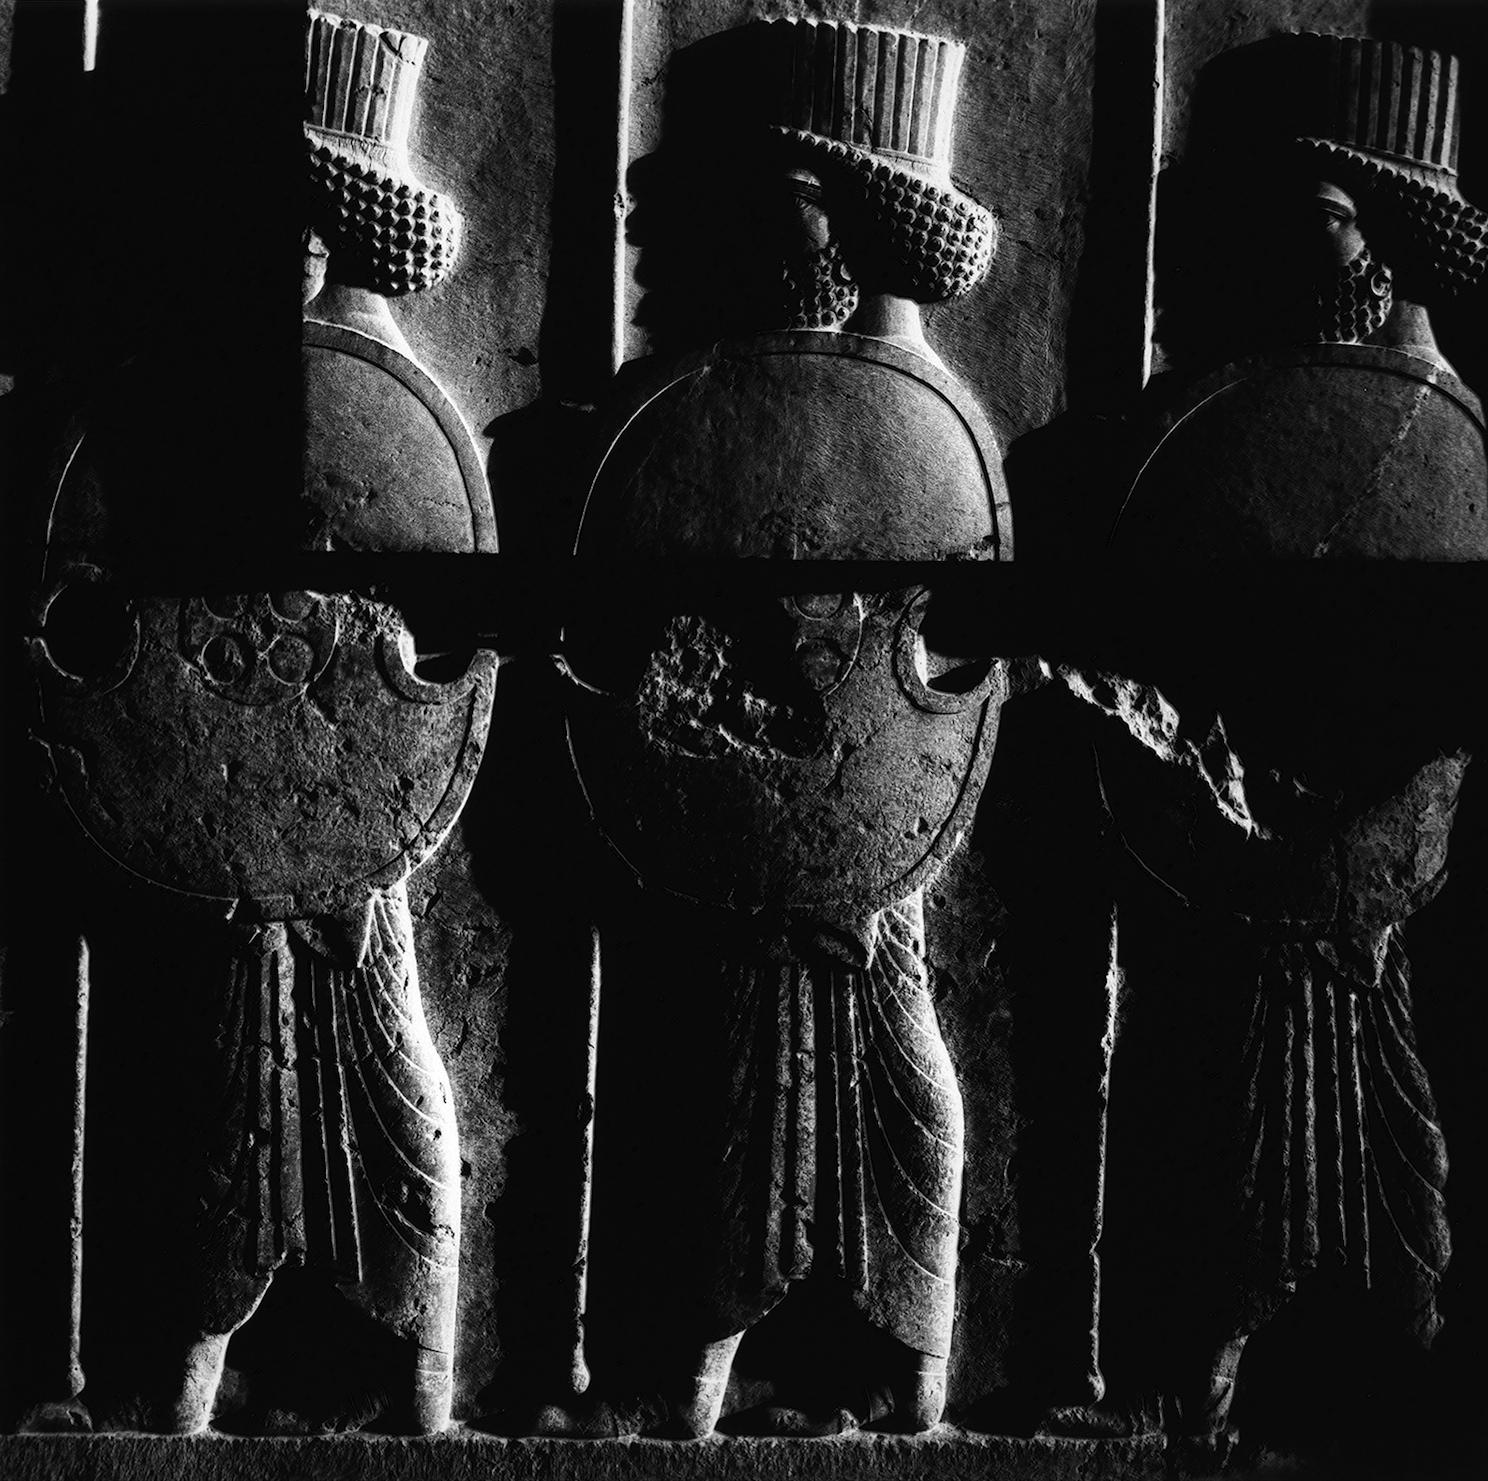 Persian Guards, Persepolis